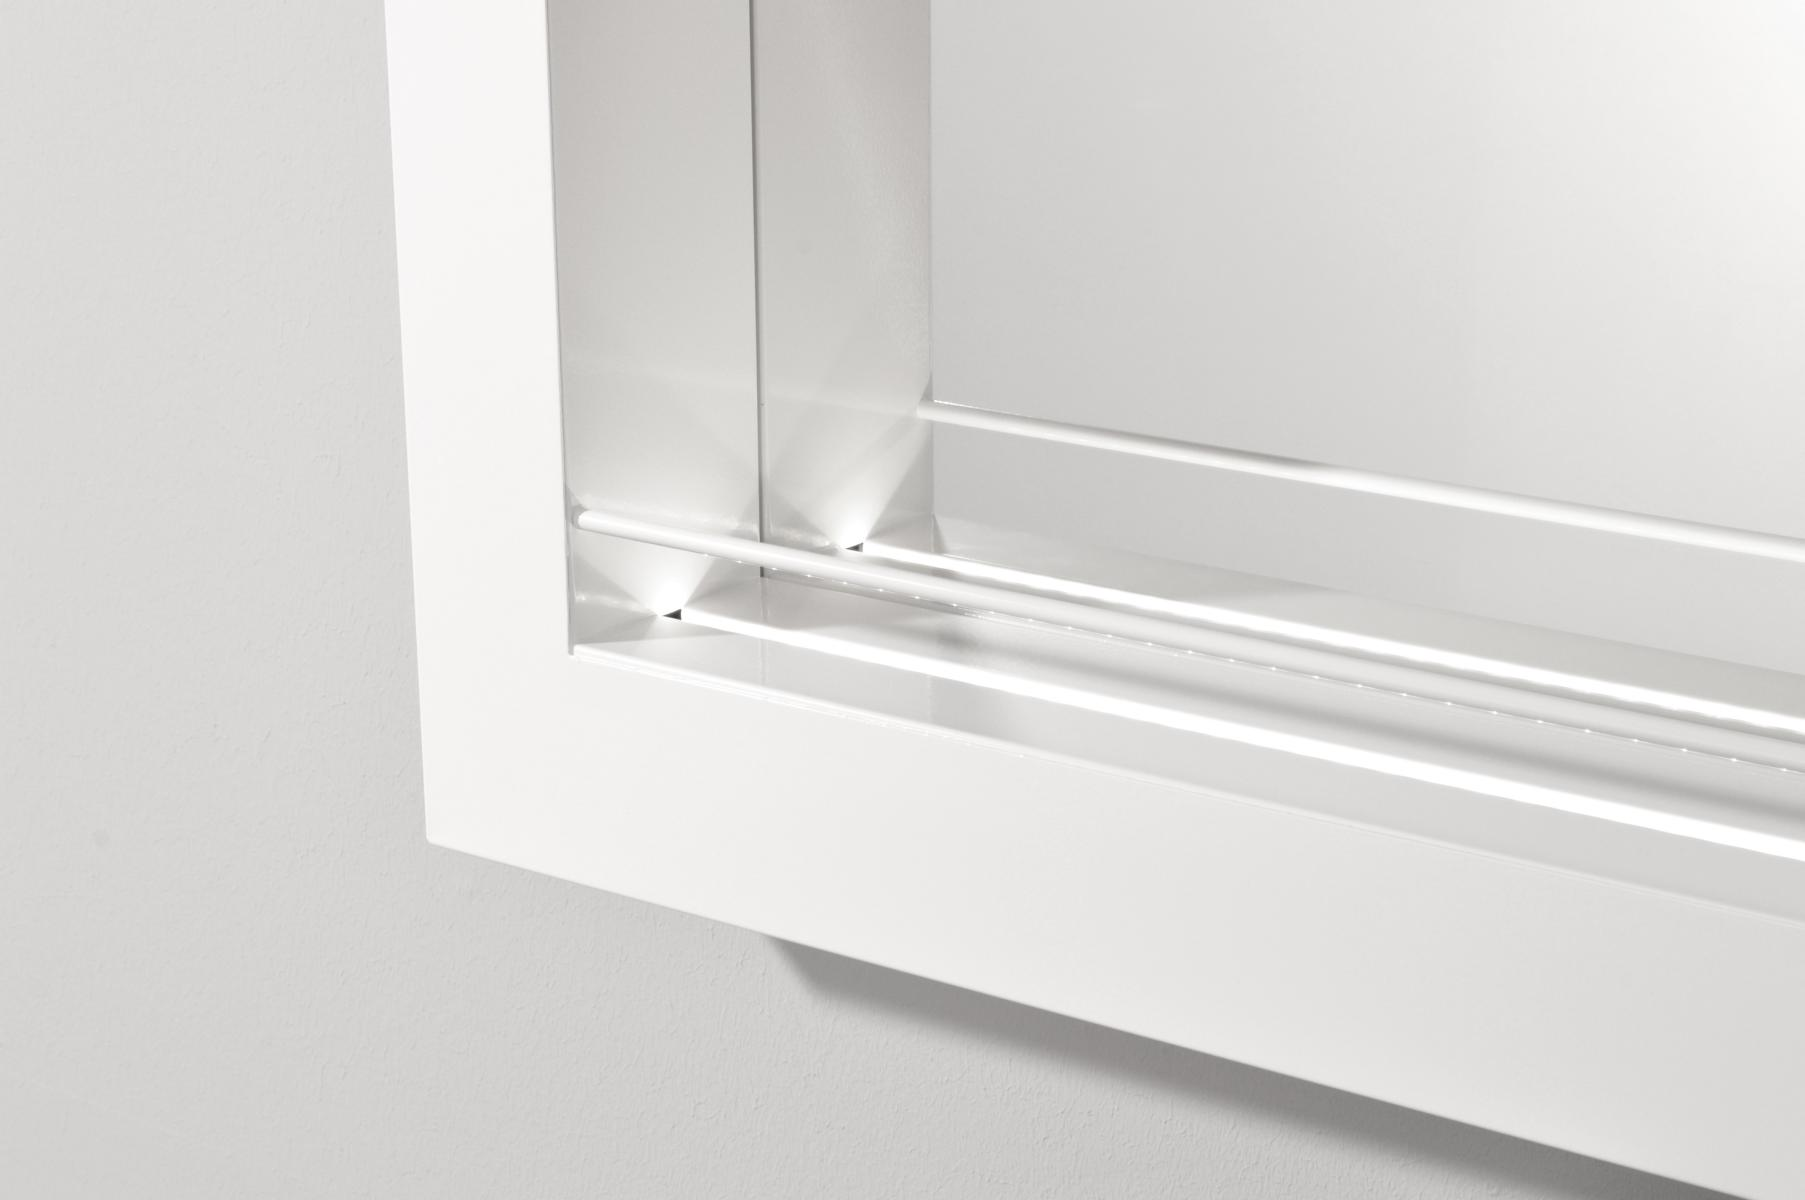 design wandbar wandregal wandregal barregal led beleuchtung mod gm649 weiss. Black Bedroom Furniture Sets. Home Design Ideas